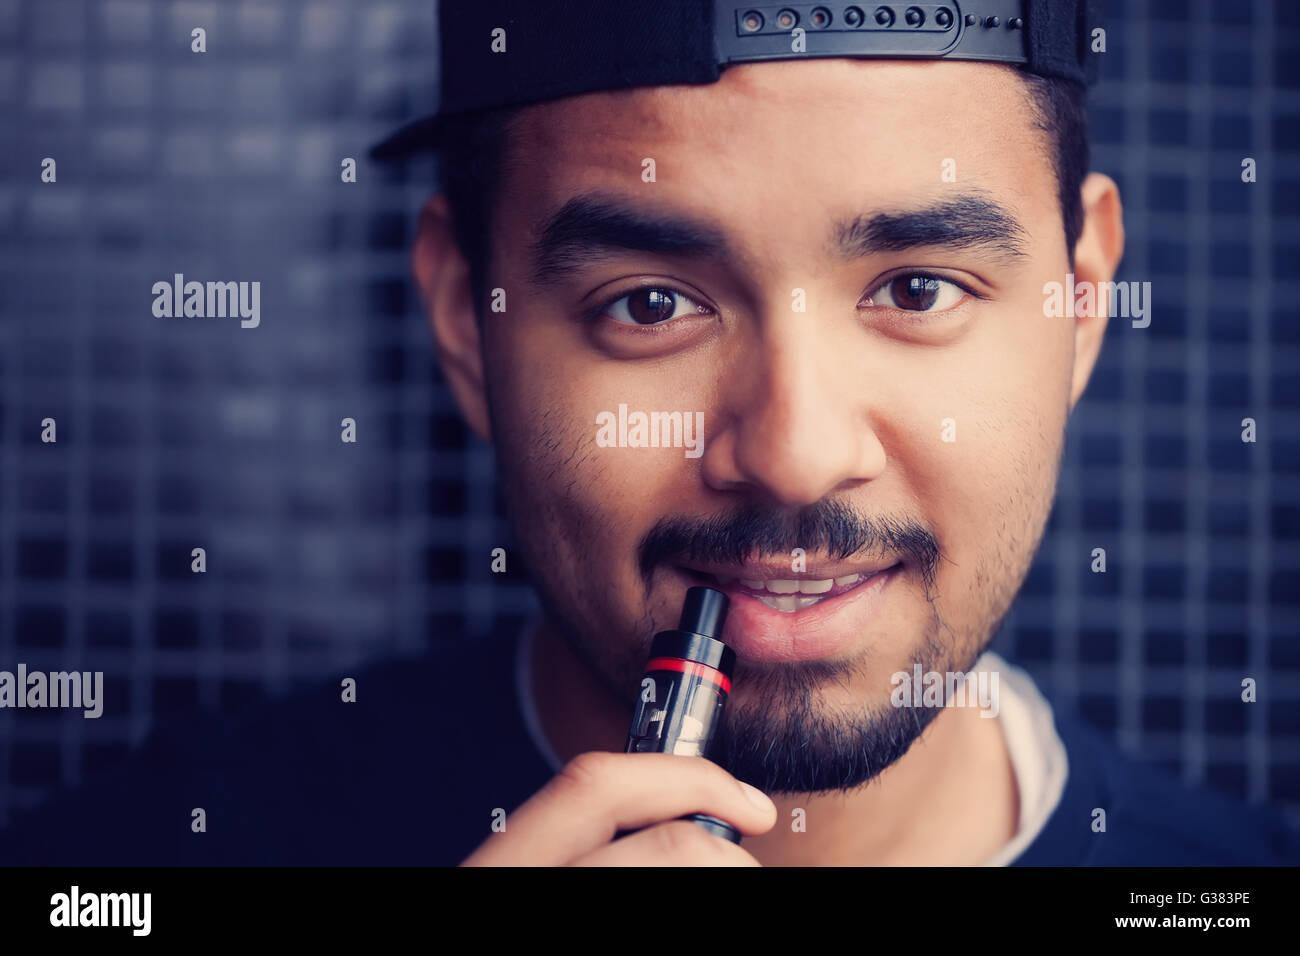 Portrait of smiling young black guy smoking trendy e-cig vaporizer. Popular modern gadget that help quit smoking - Stock Image